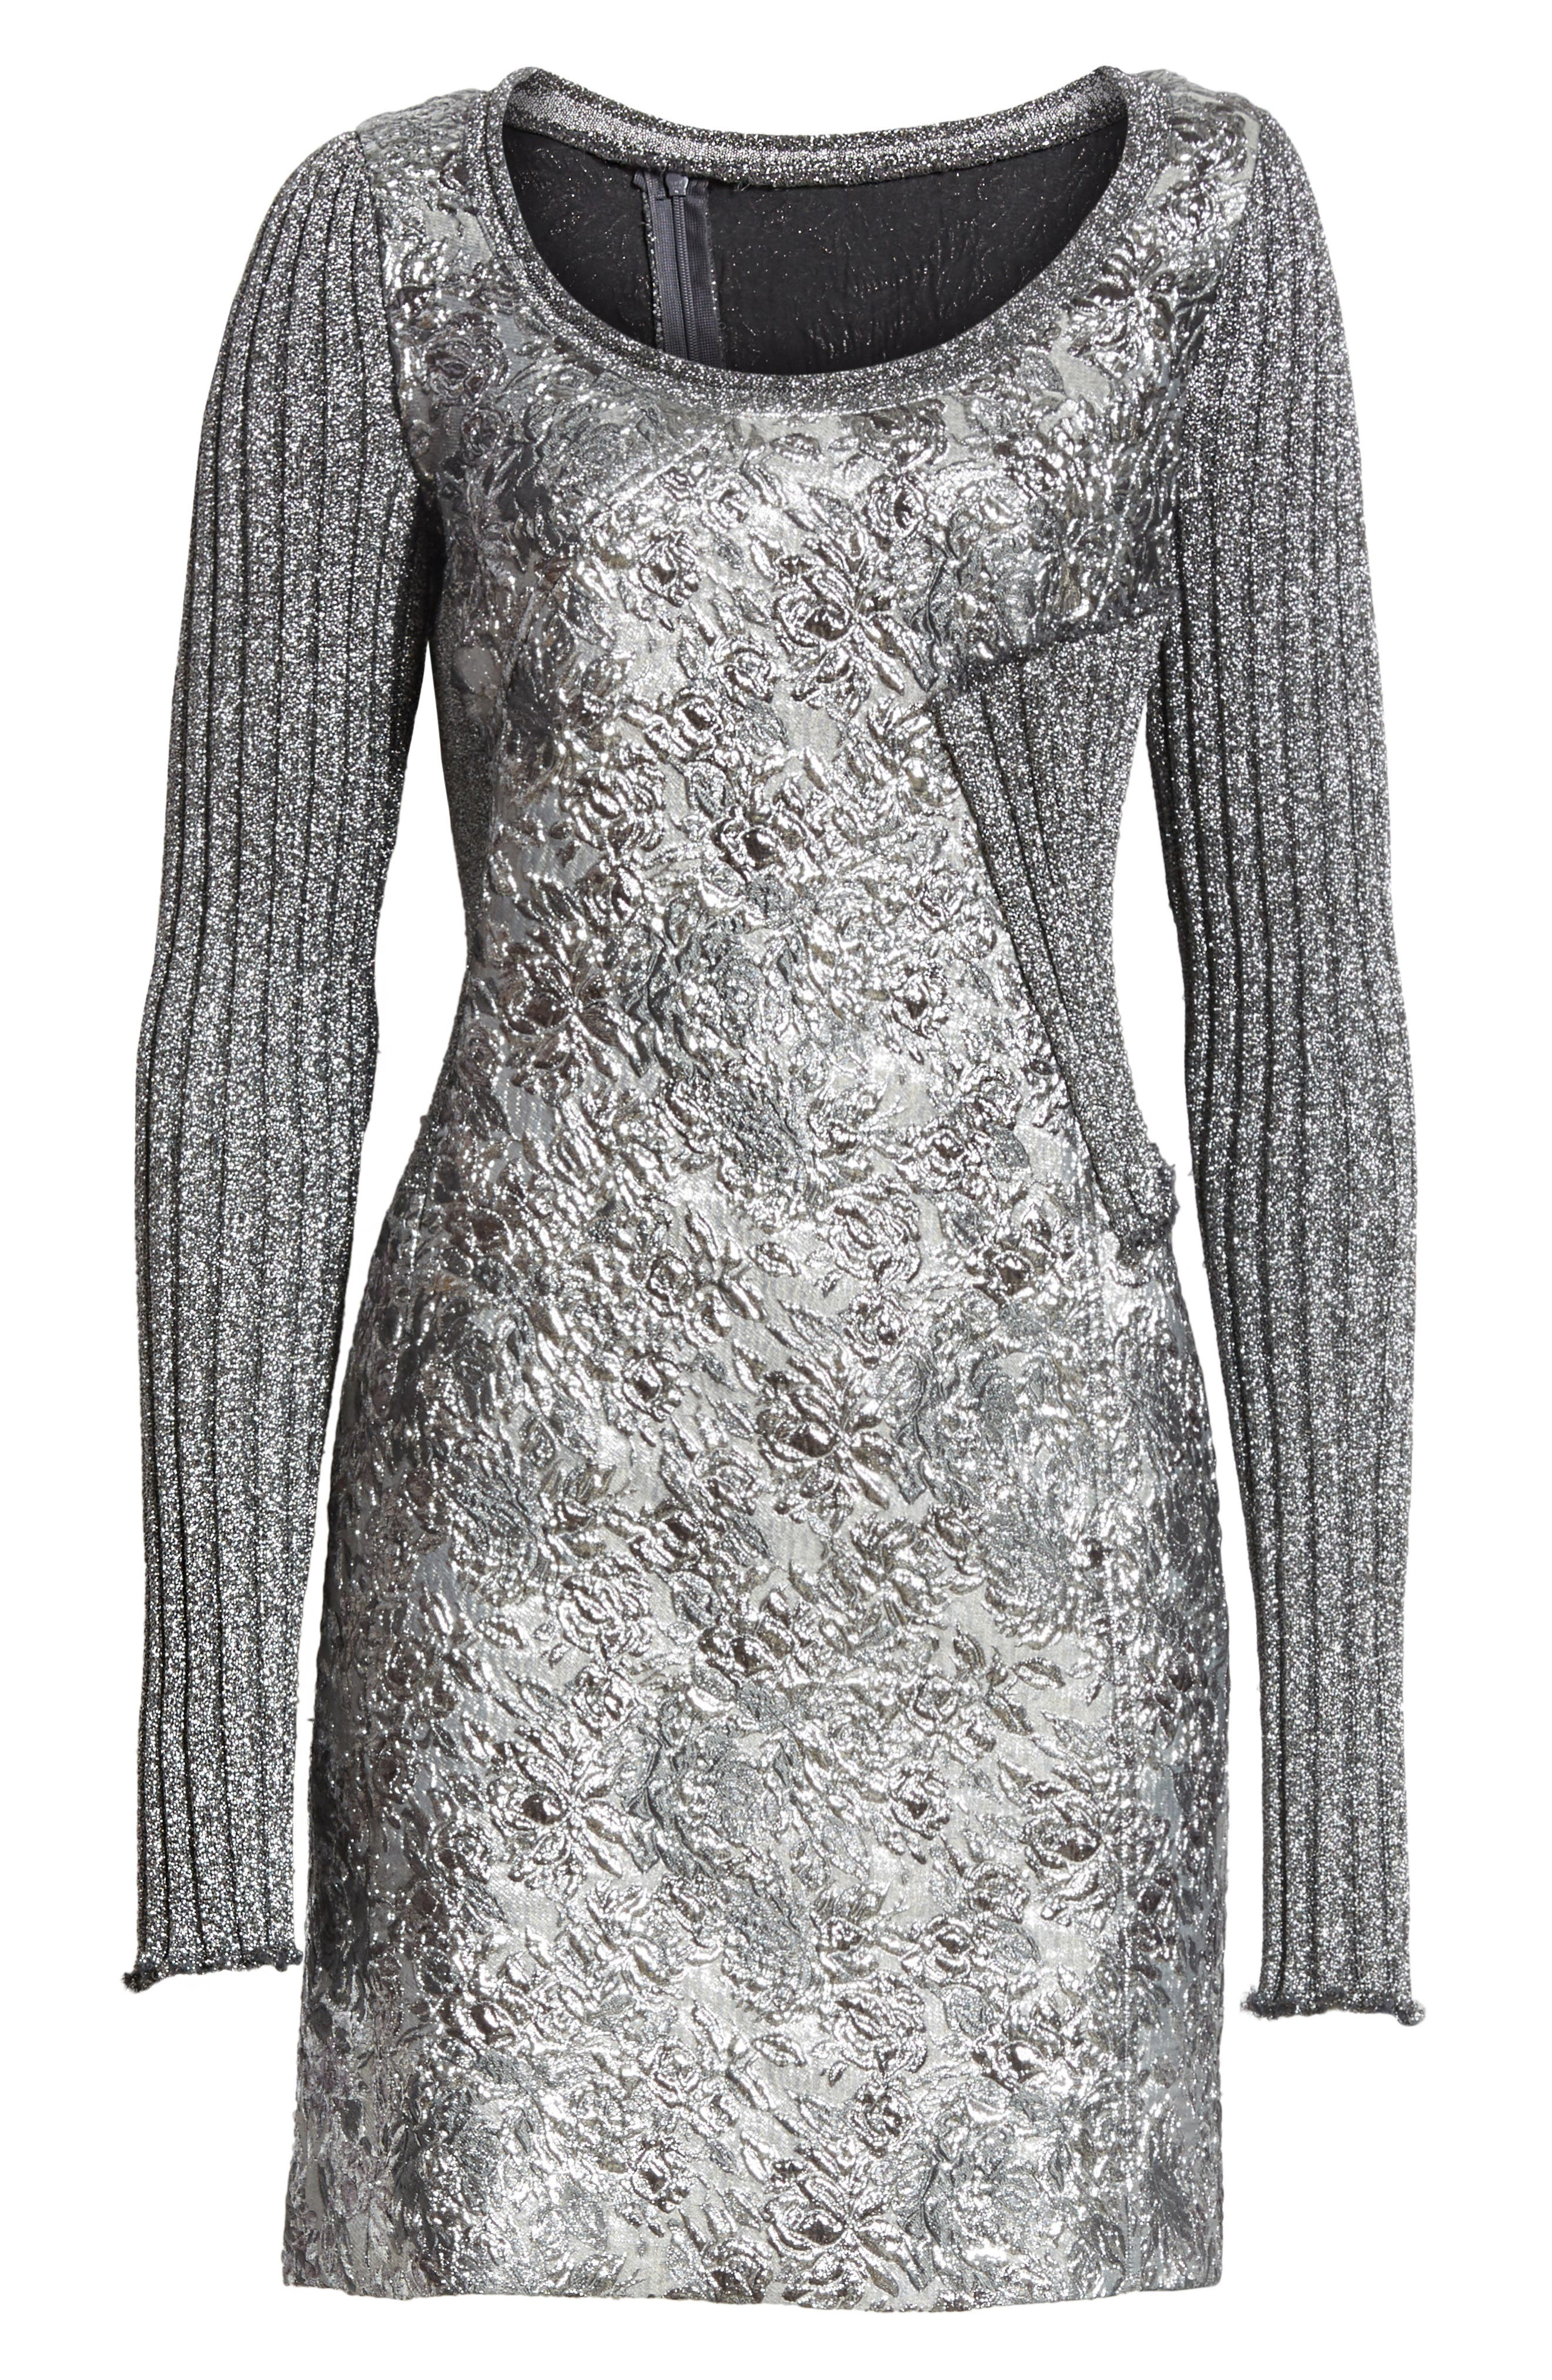 Mixed Media Metallic Sweater Dress,                             Alternate thumbnail 6, color,                             040